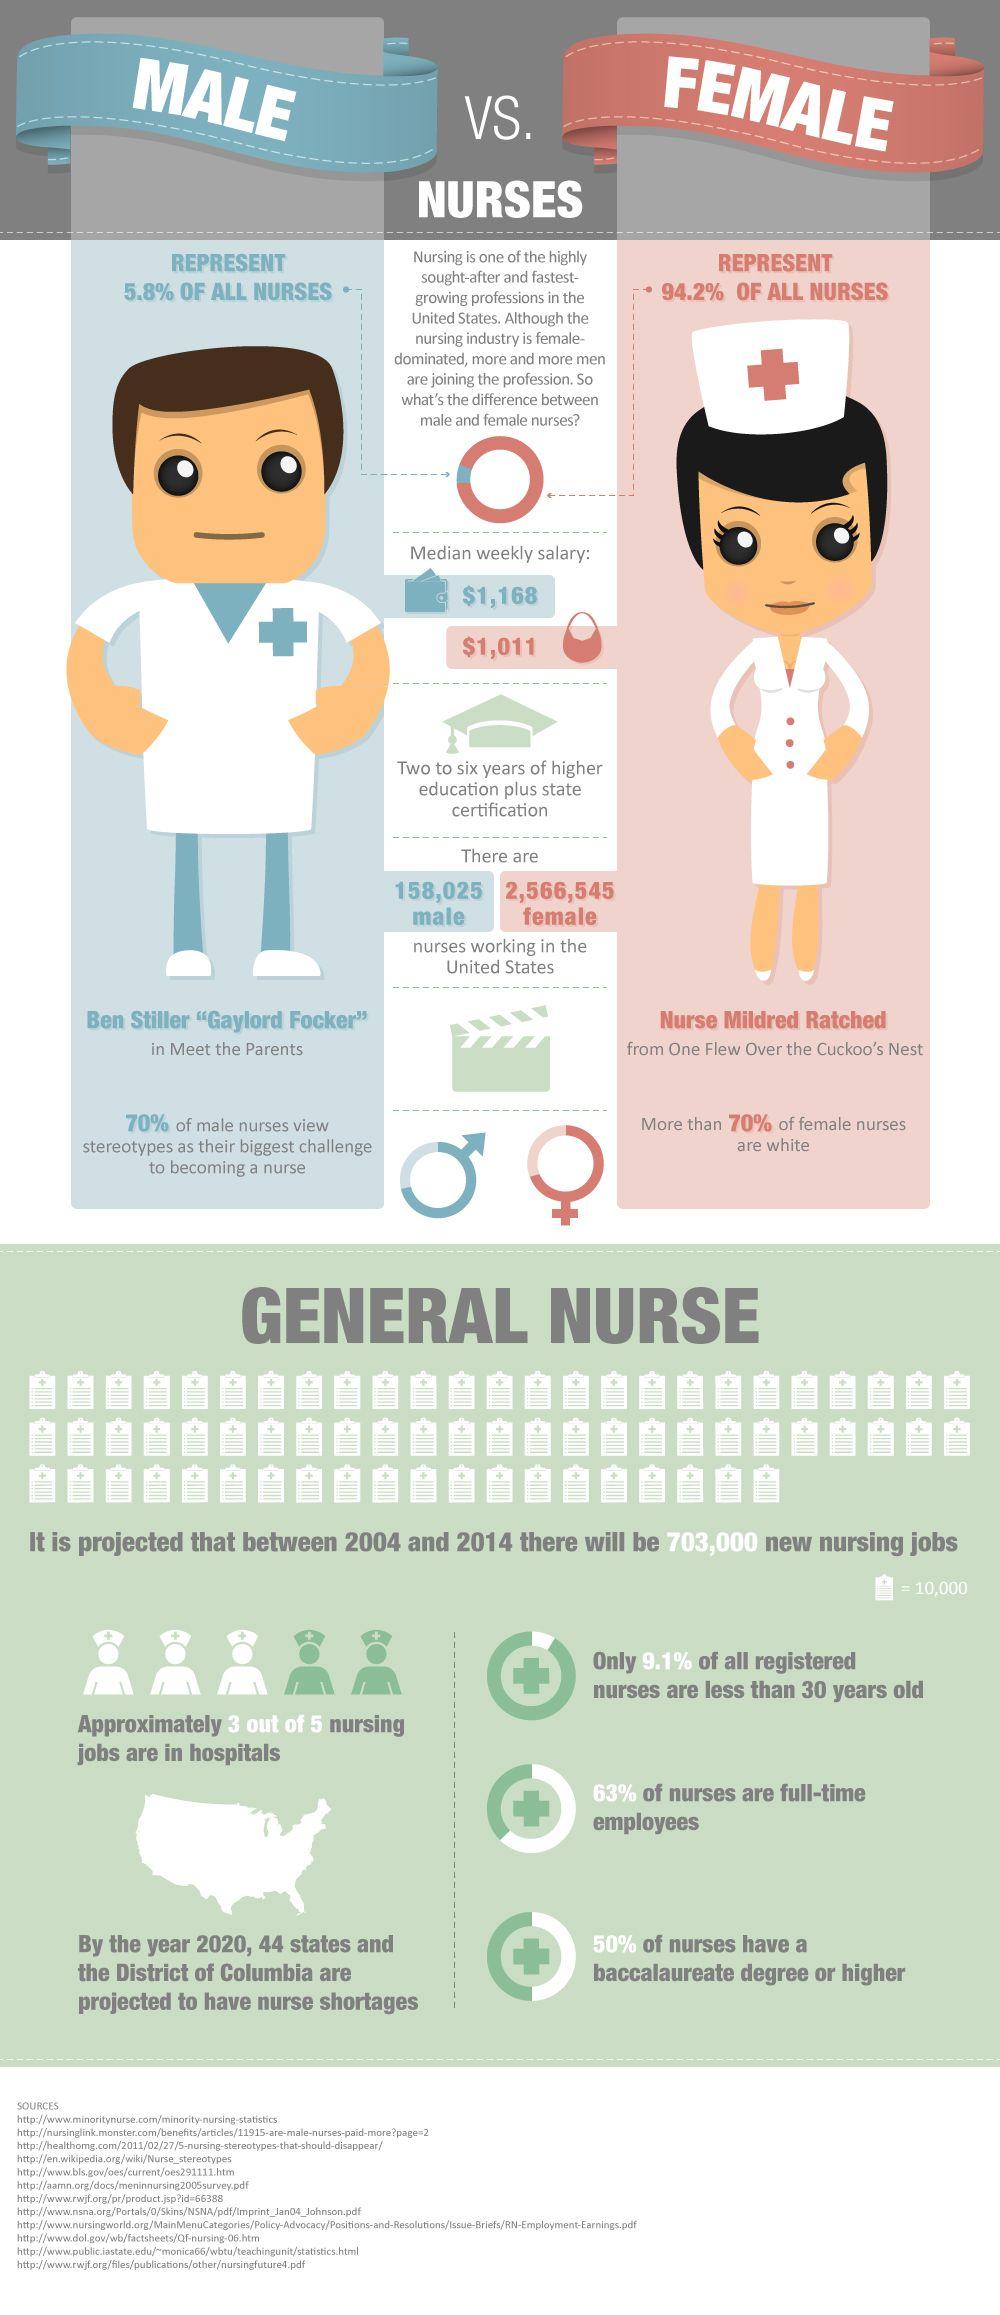 Male Vs Female Nurses Infographic Nursing Infographic Male